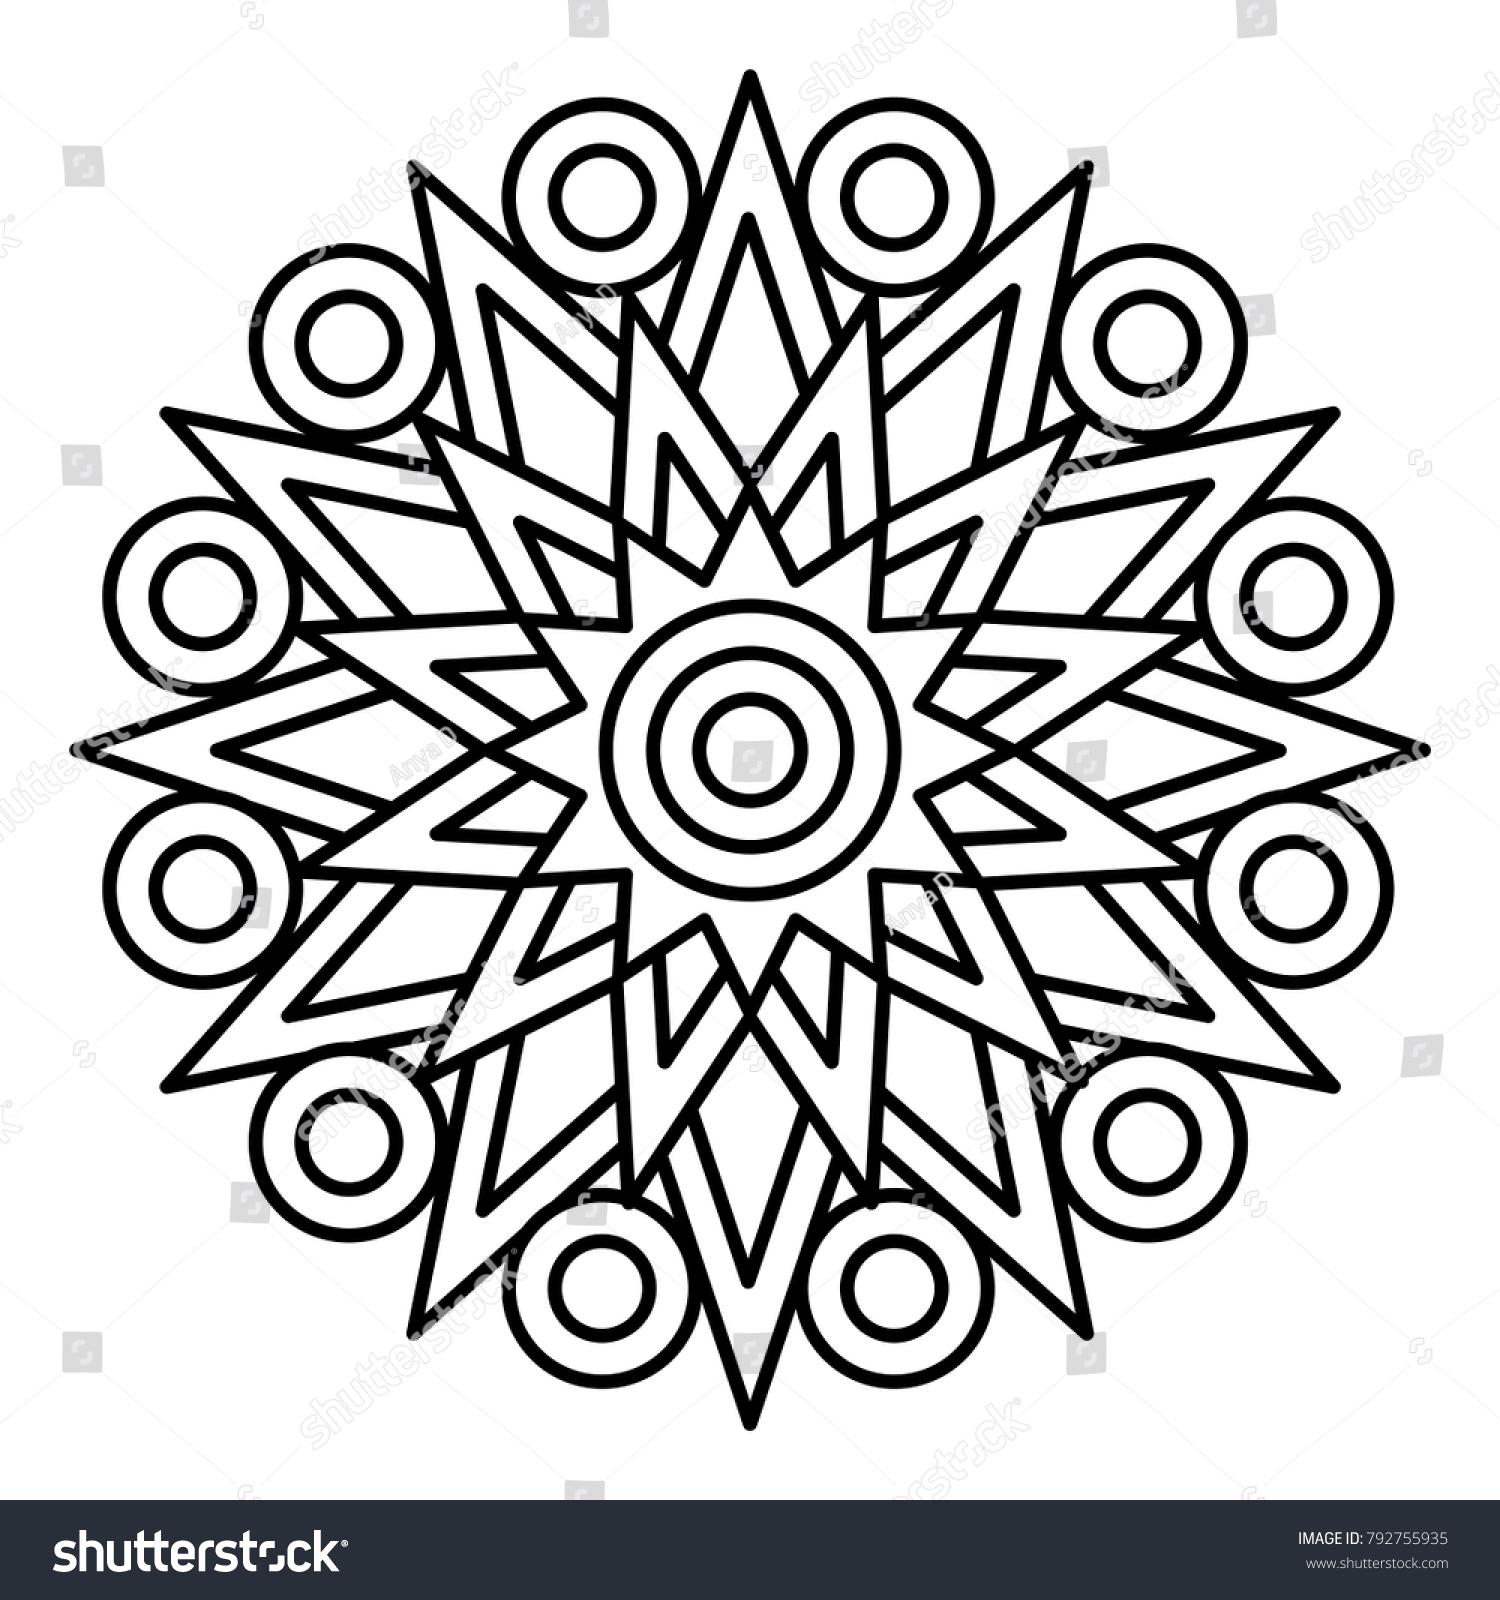 Simple Floral Mandala Print Easy Coloring Stock Vector 792755935 ...